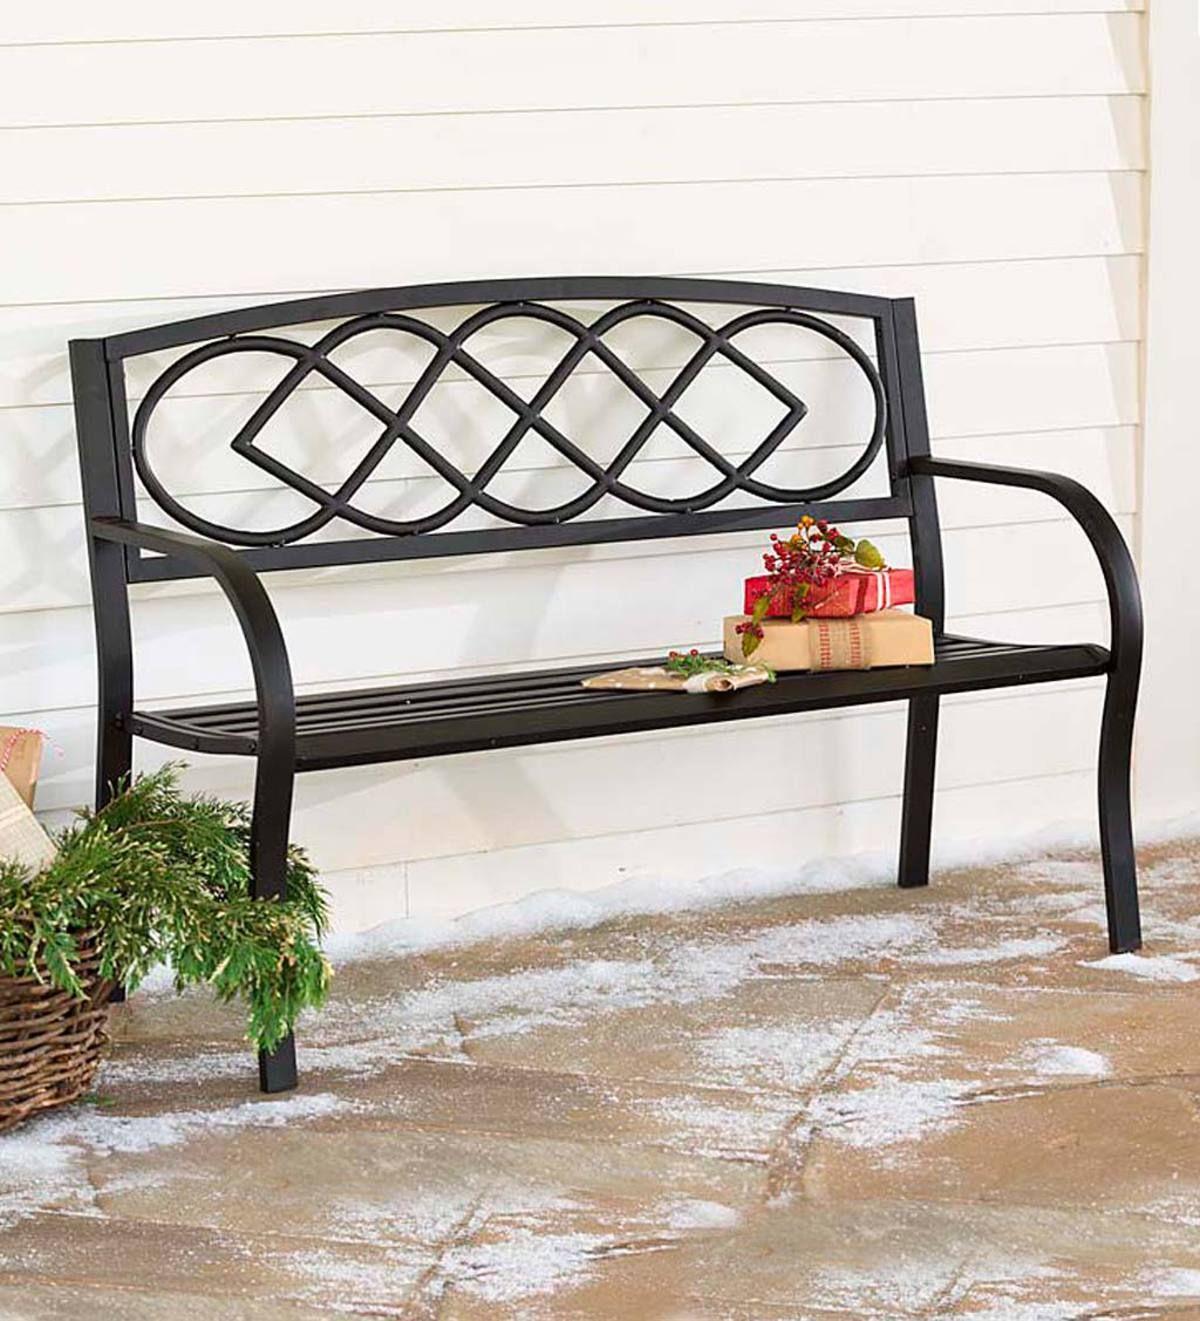 Celtic Knot Garden Bench | Outdoor Garden Bench, Garden With Alvah Slatted Cast Iron And Tubular Steel Garden Benches (View 25 of 25)